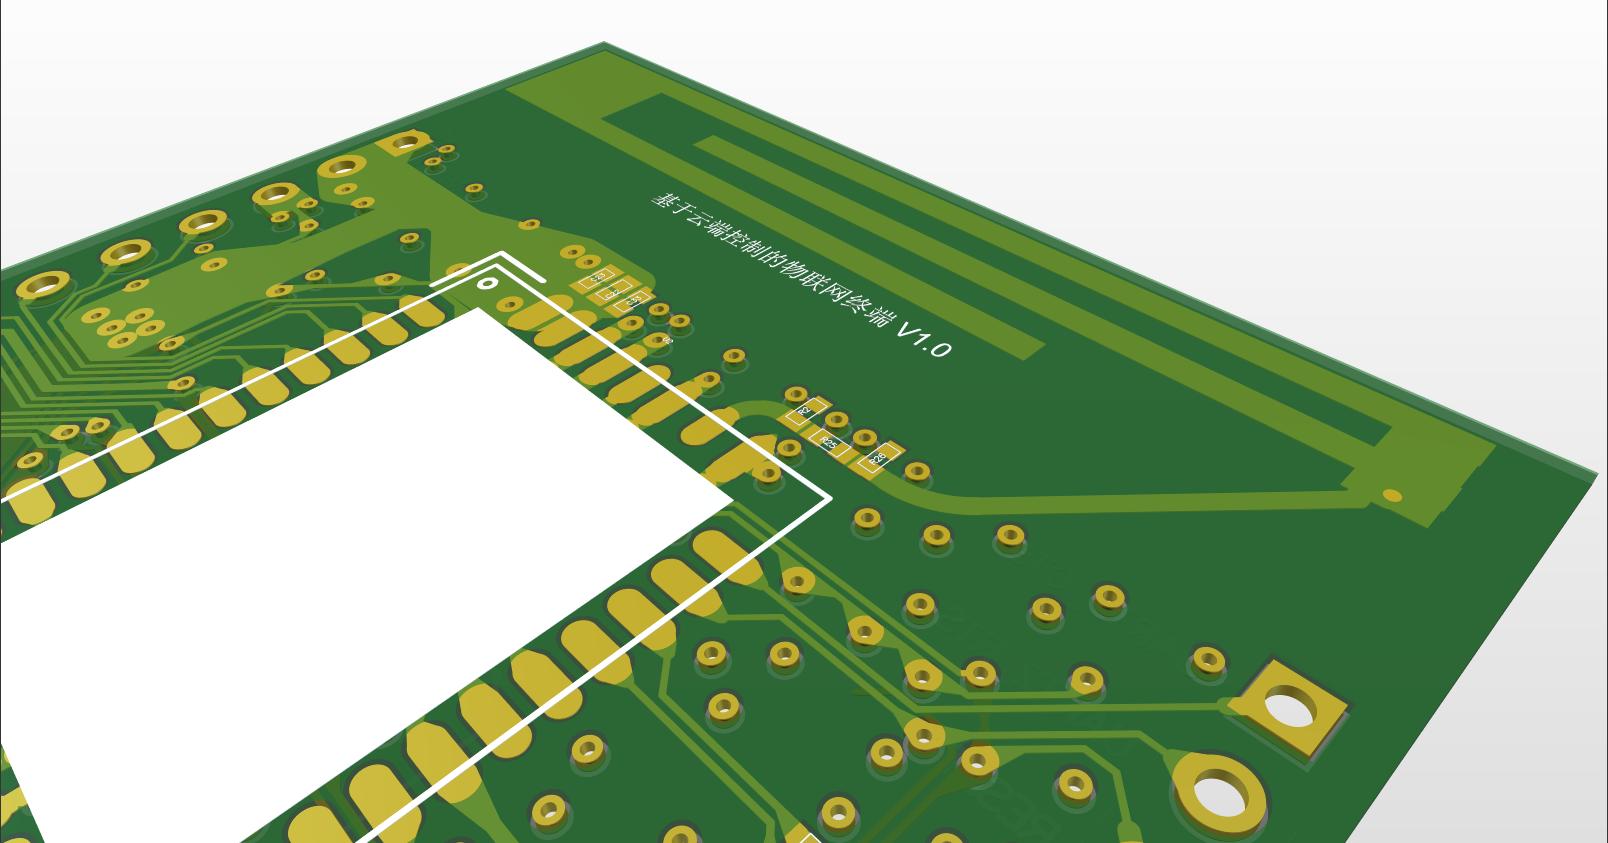 PCB渲染图-正面细节.png